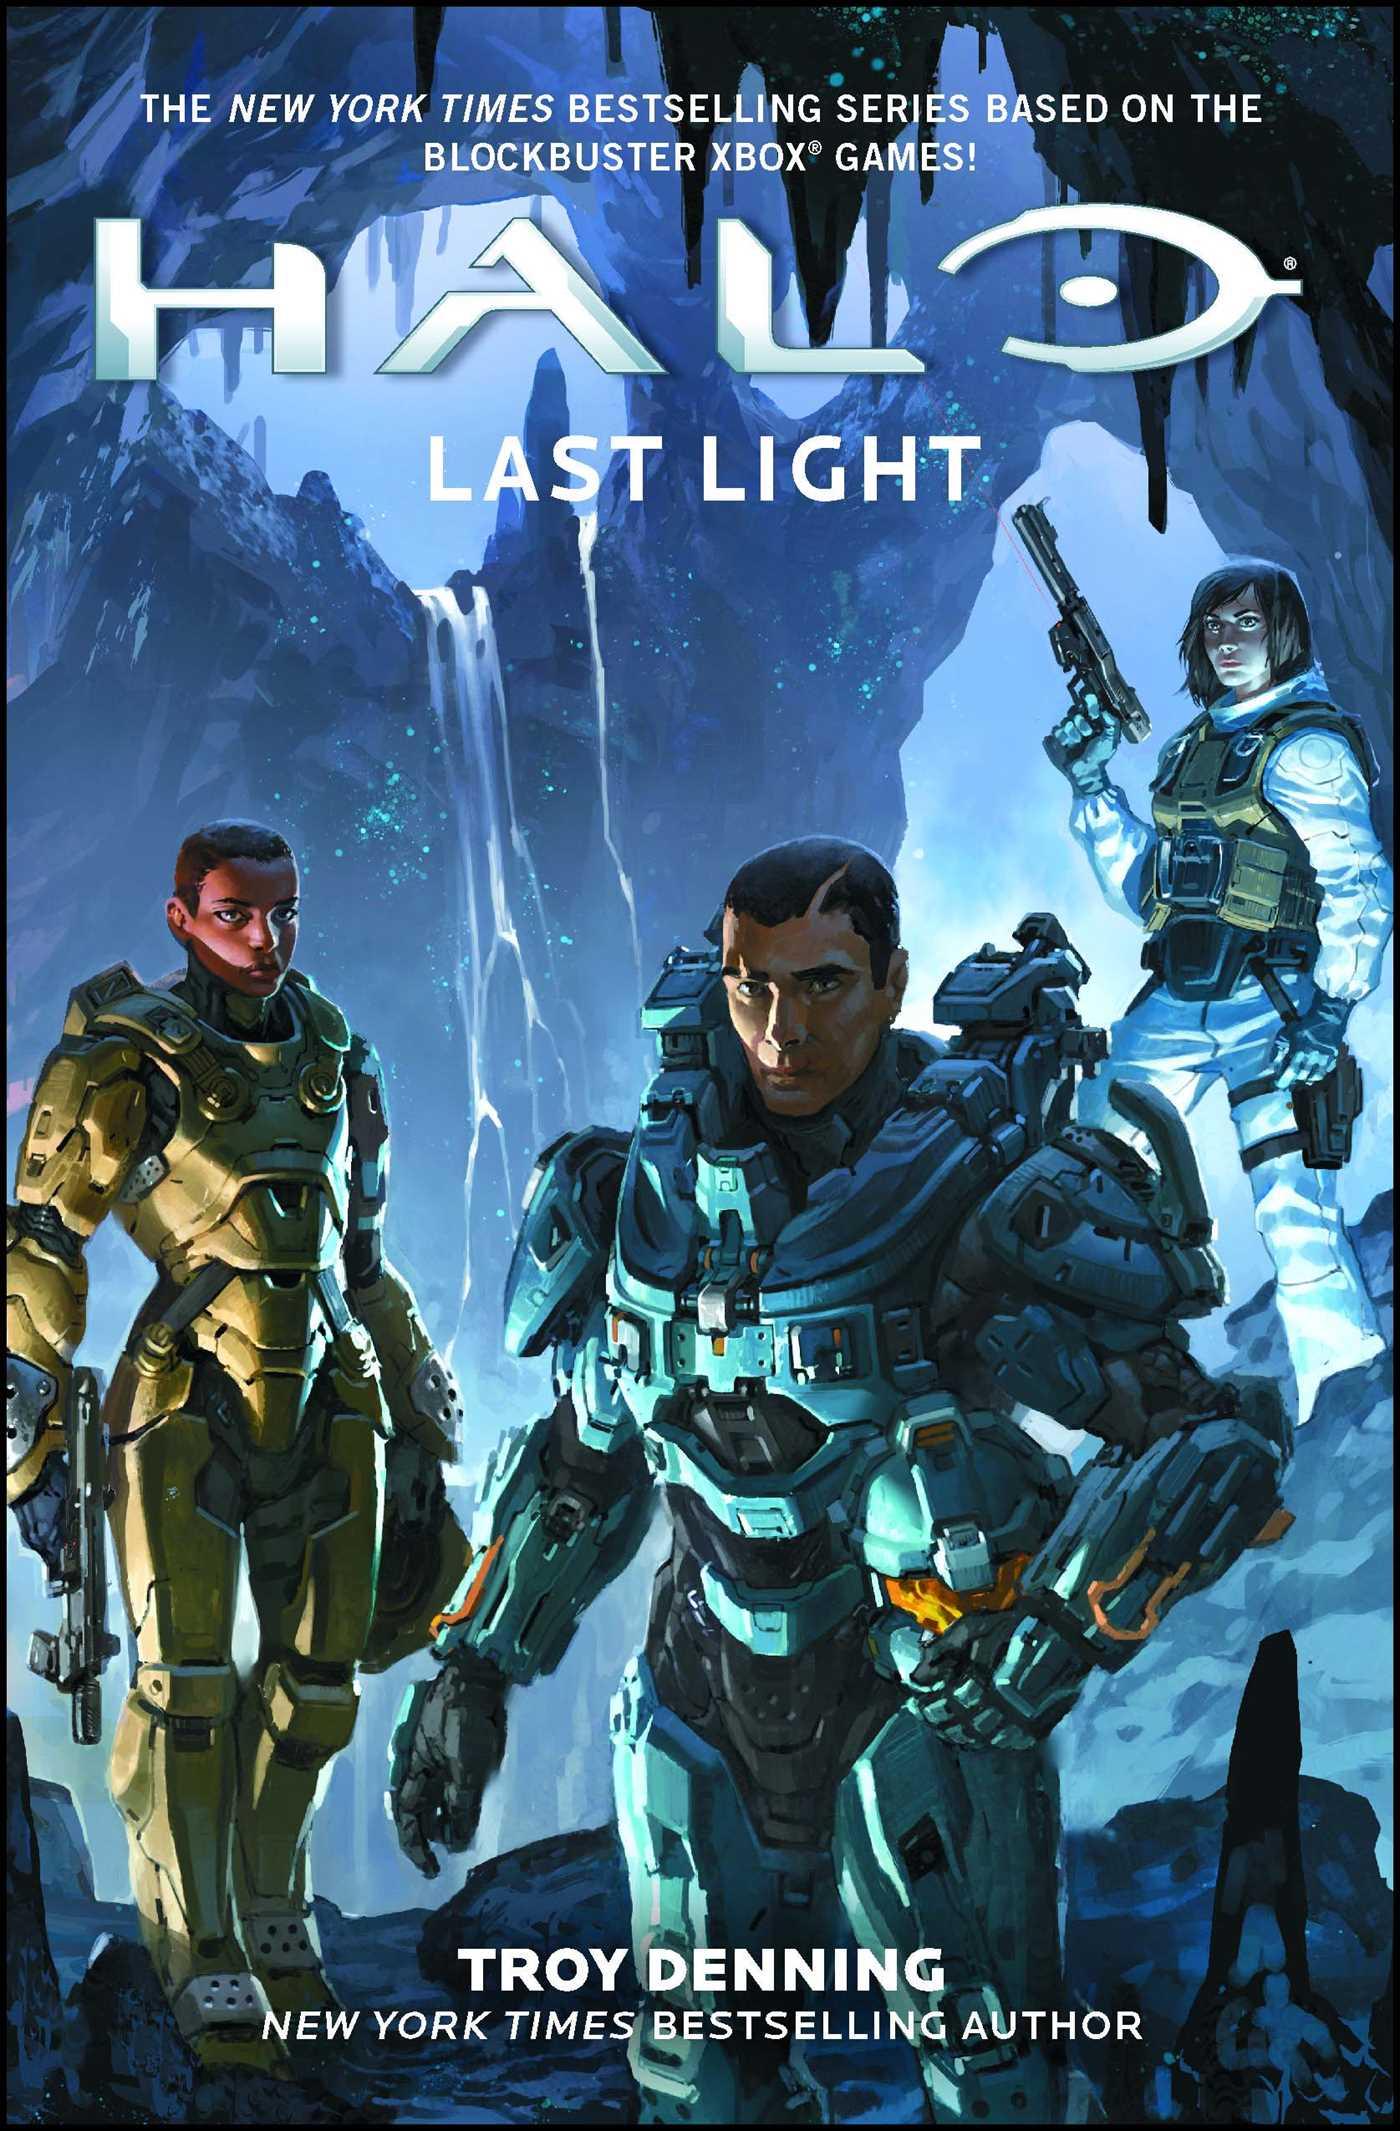 Halo last light 9781501103360 hr